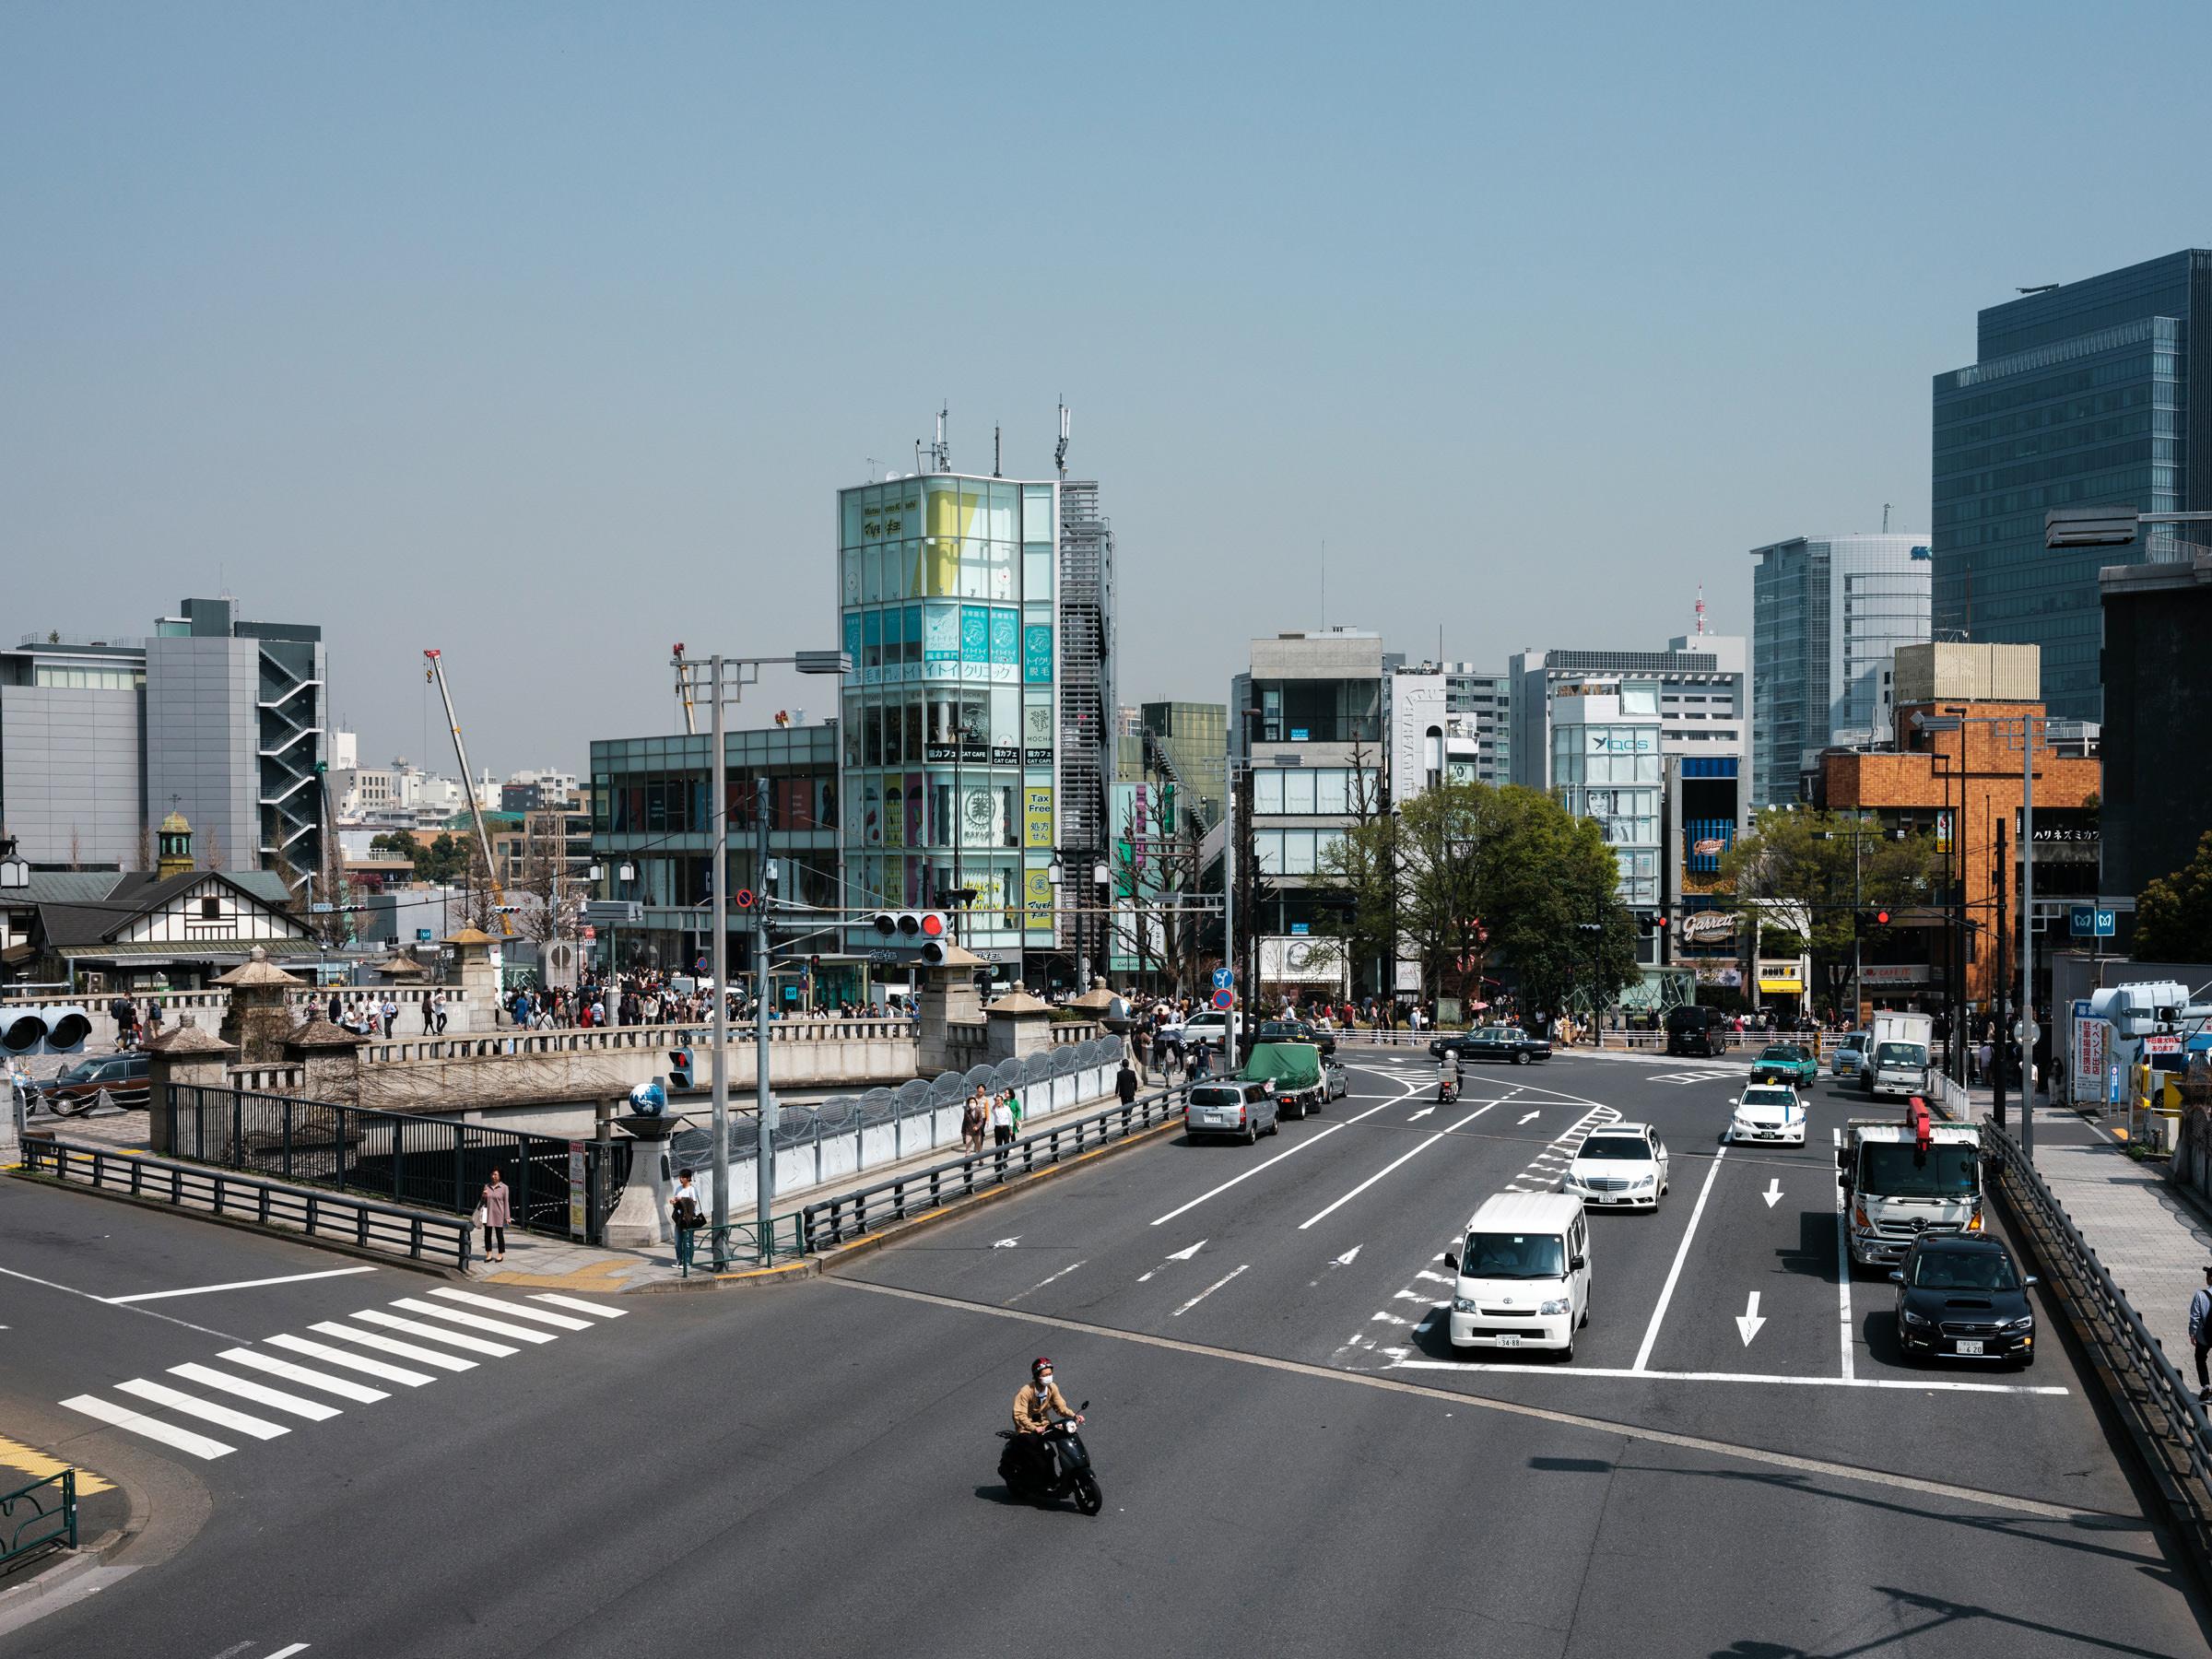 Fujifilm-GFX-Japan-Street-Photography-39